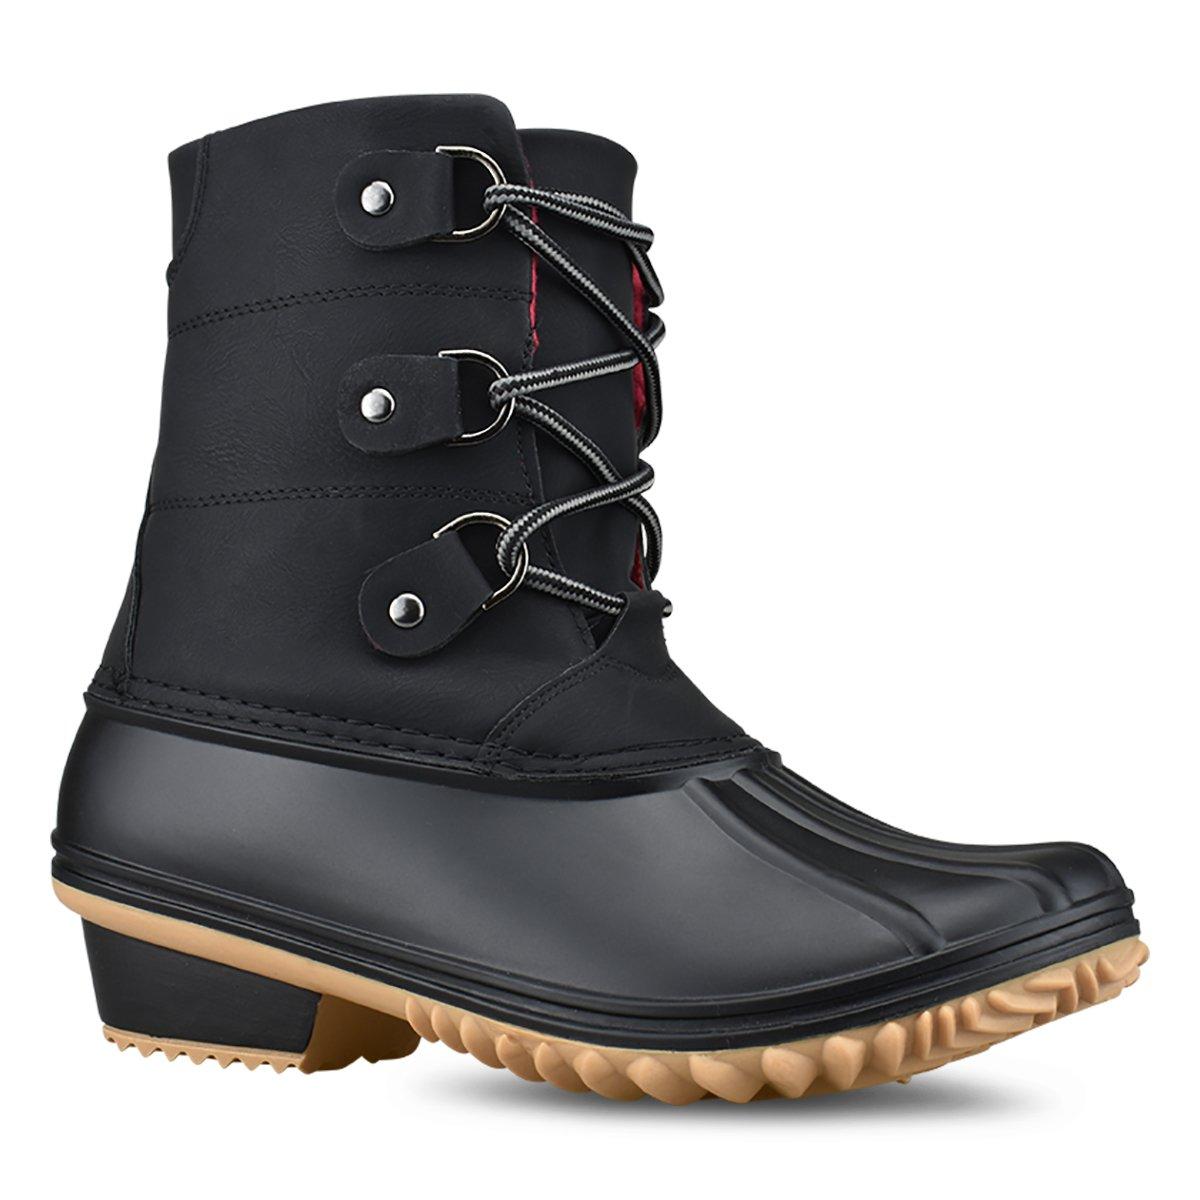 Premier Standard Women Stitching Lace Up Side Zip Waterproof Insulated Snow Boots B07974XS8V 8.5 B(M) US|Premium Black